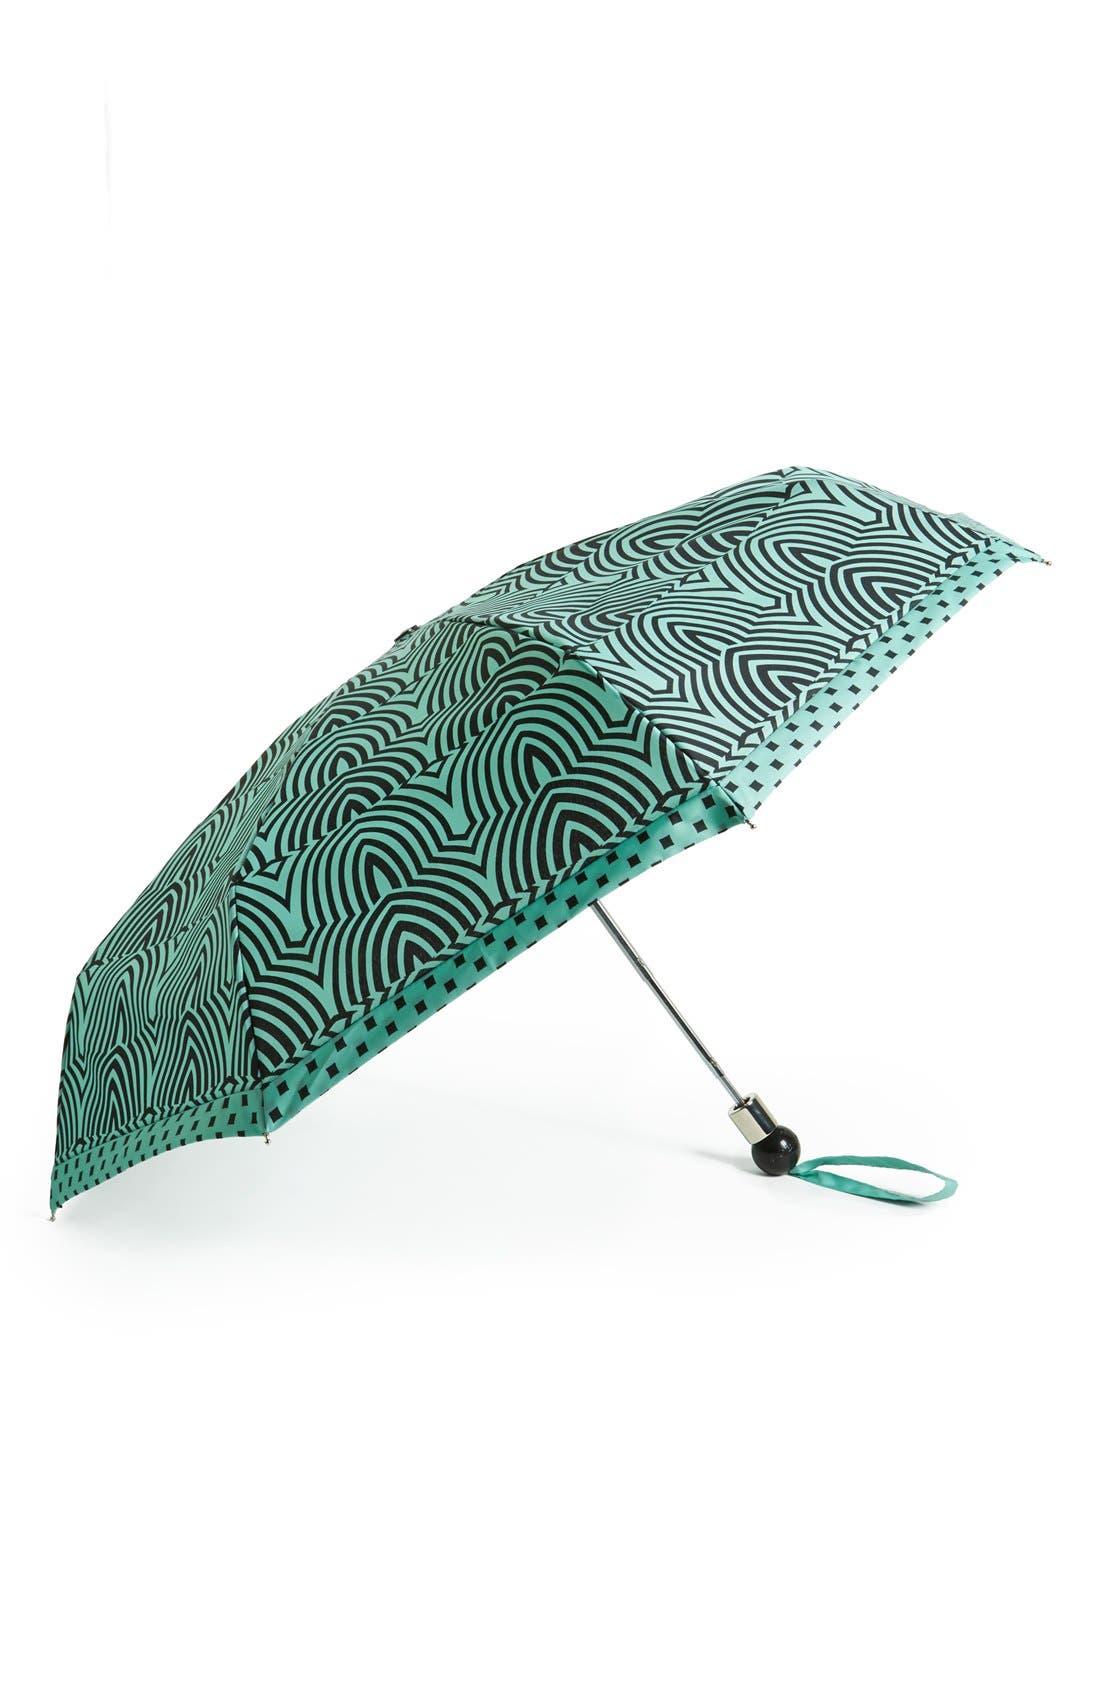 Main Image - MARC BY MARC JACOBS 'Radiowaves' Umbrella